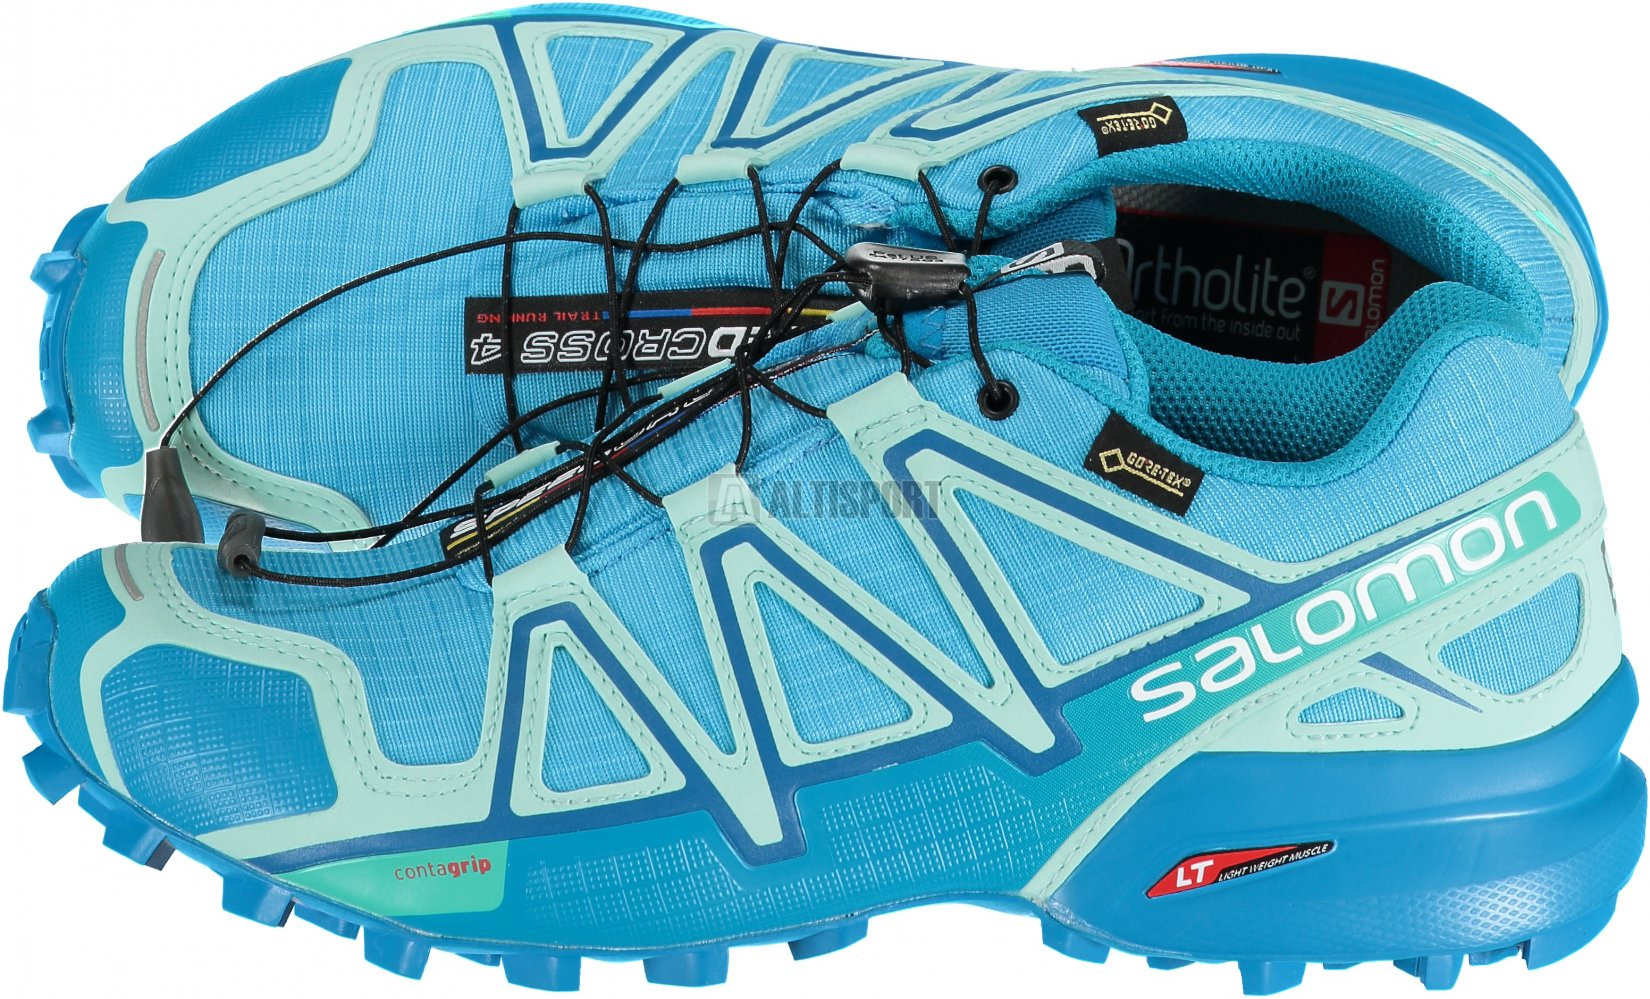 c9756f35c7a Dámské běžecké boty SALOMON SPEEDCROSS 4 GTX® W L40099900 AQUARIUS BEACH  GLASS HAWAIIAN